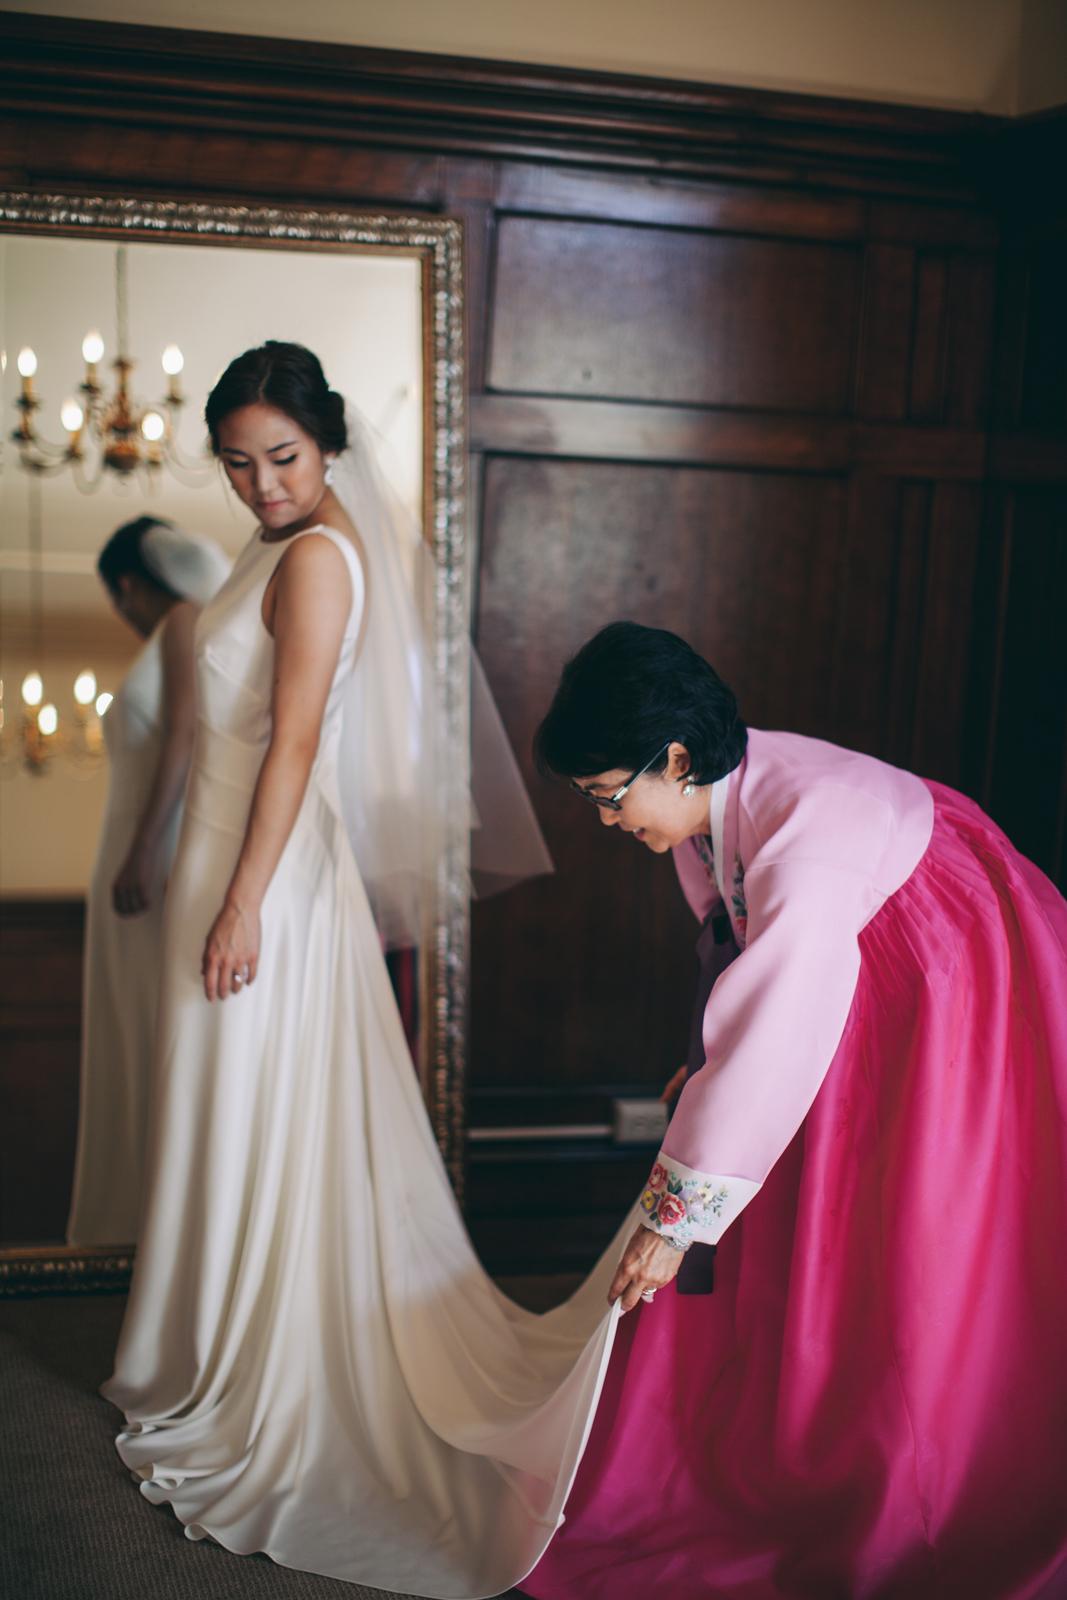 kohl_manison_wedding_photography_sarah_eric_ebony_siovhan_bokeh_photography_014.jpg